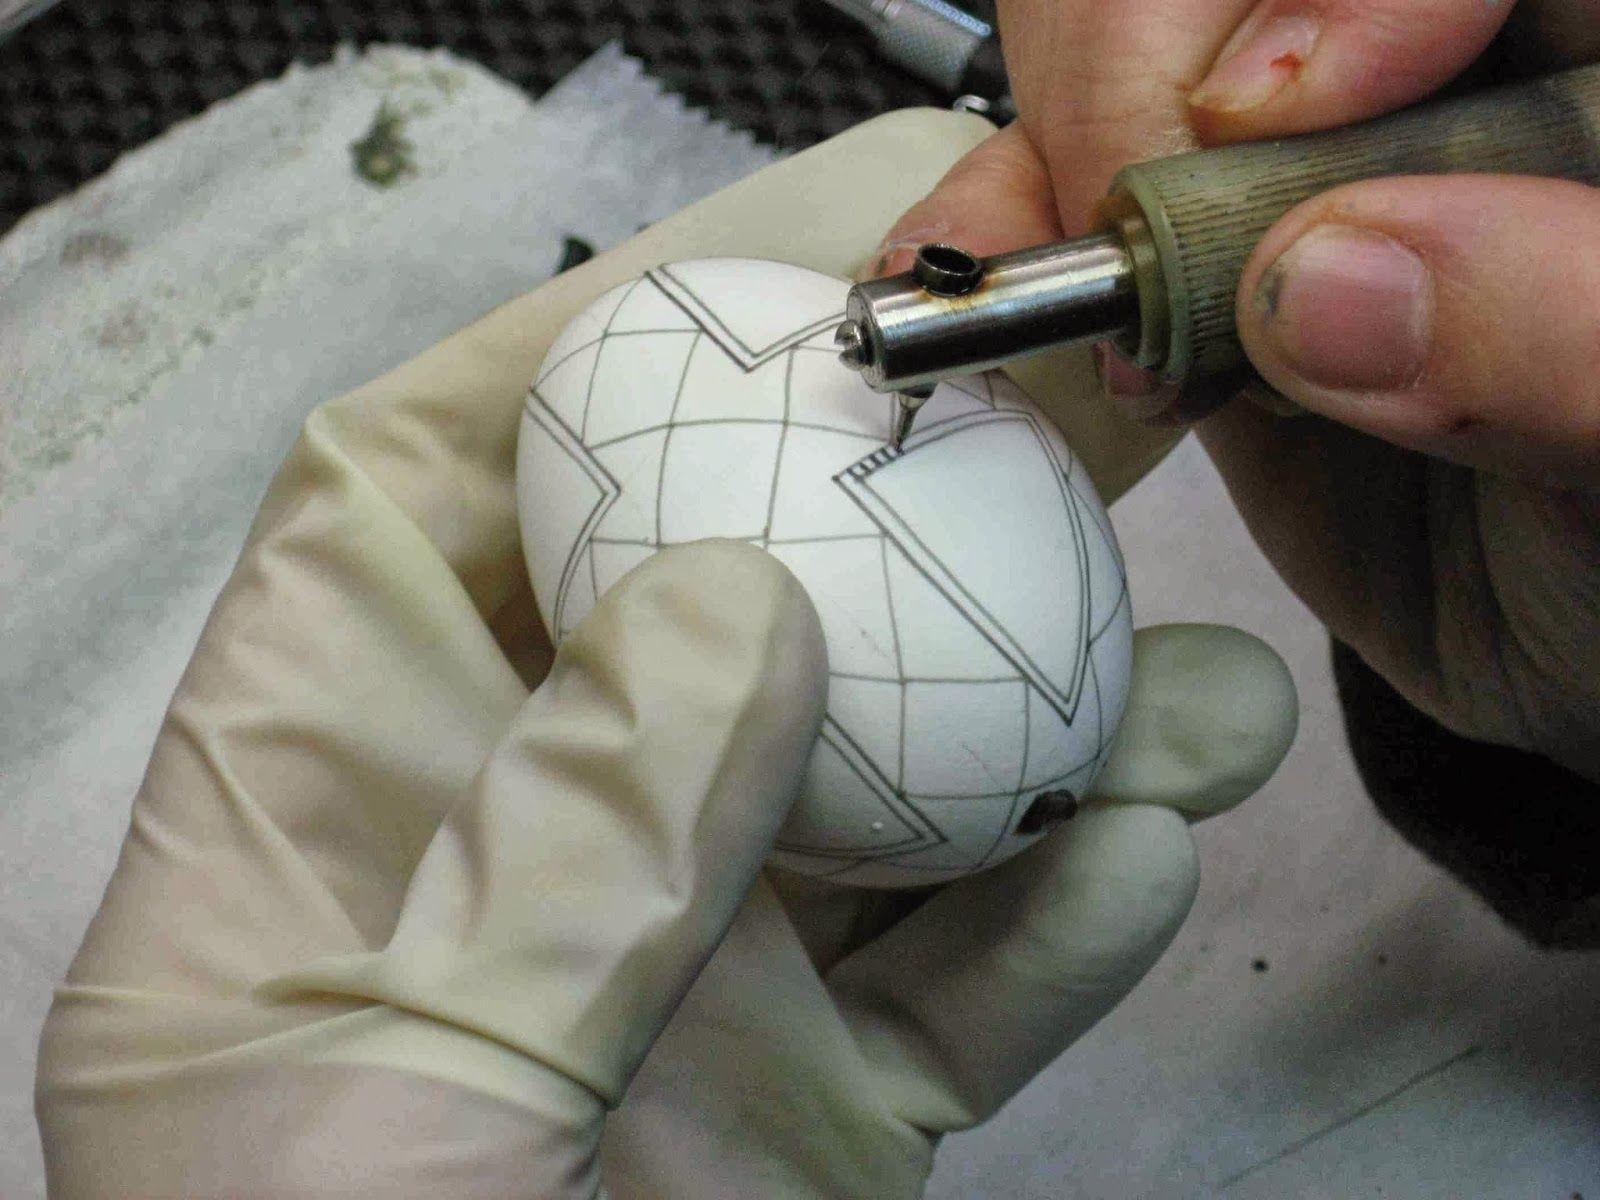 Precision Art Studio Blog: Ukrainian Egg Demonstrations for 2014 by Theresa Somerset of Precision Studio (Decorative Eggs)